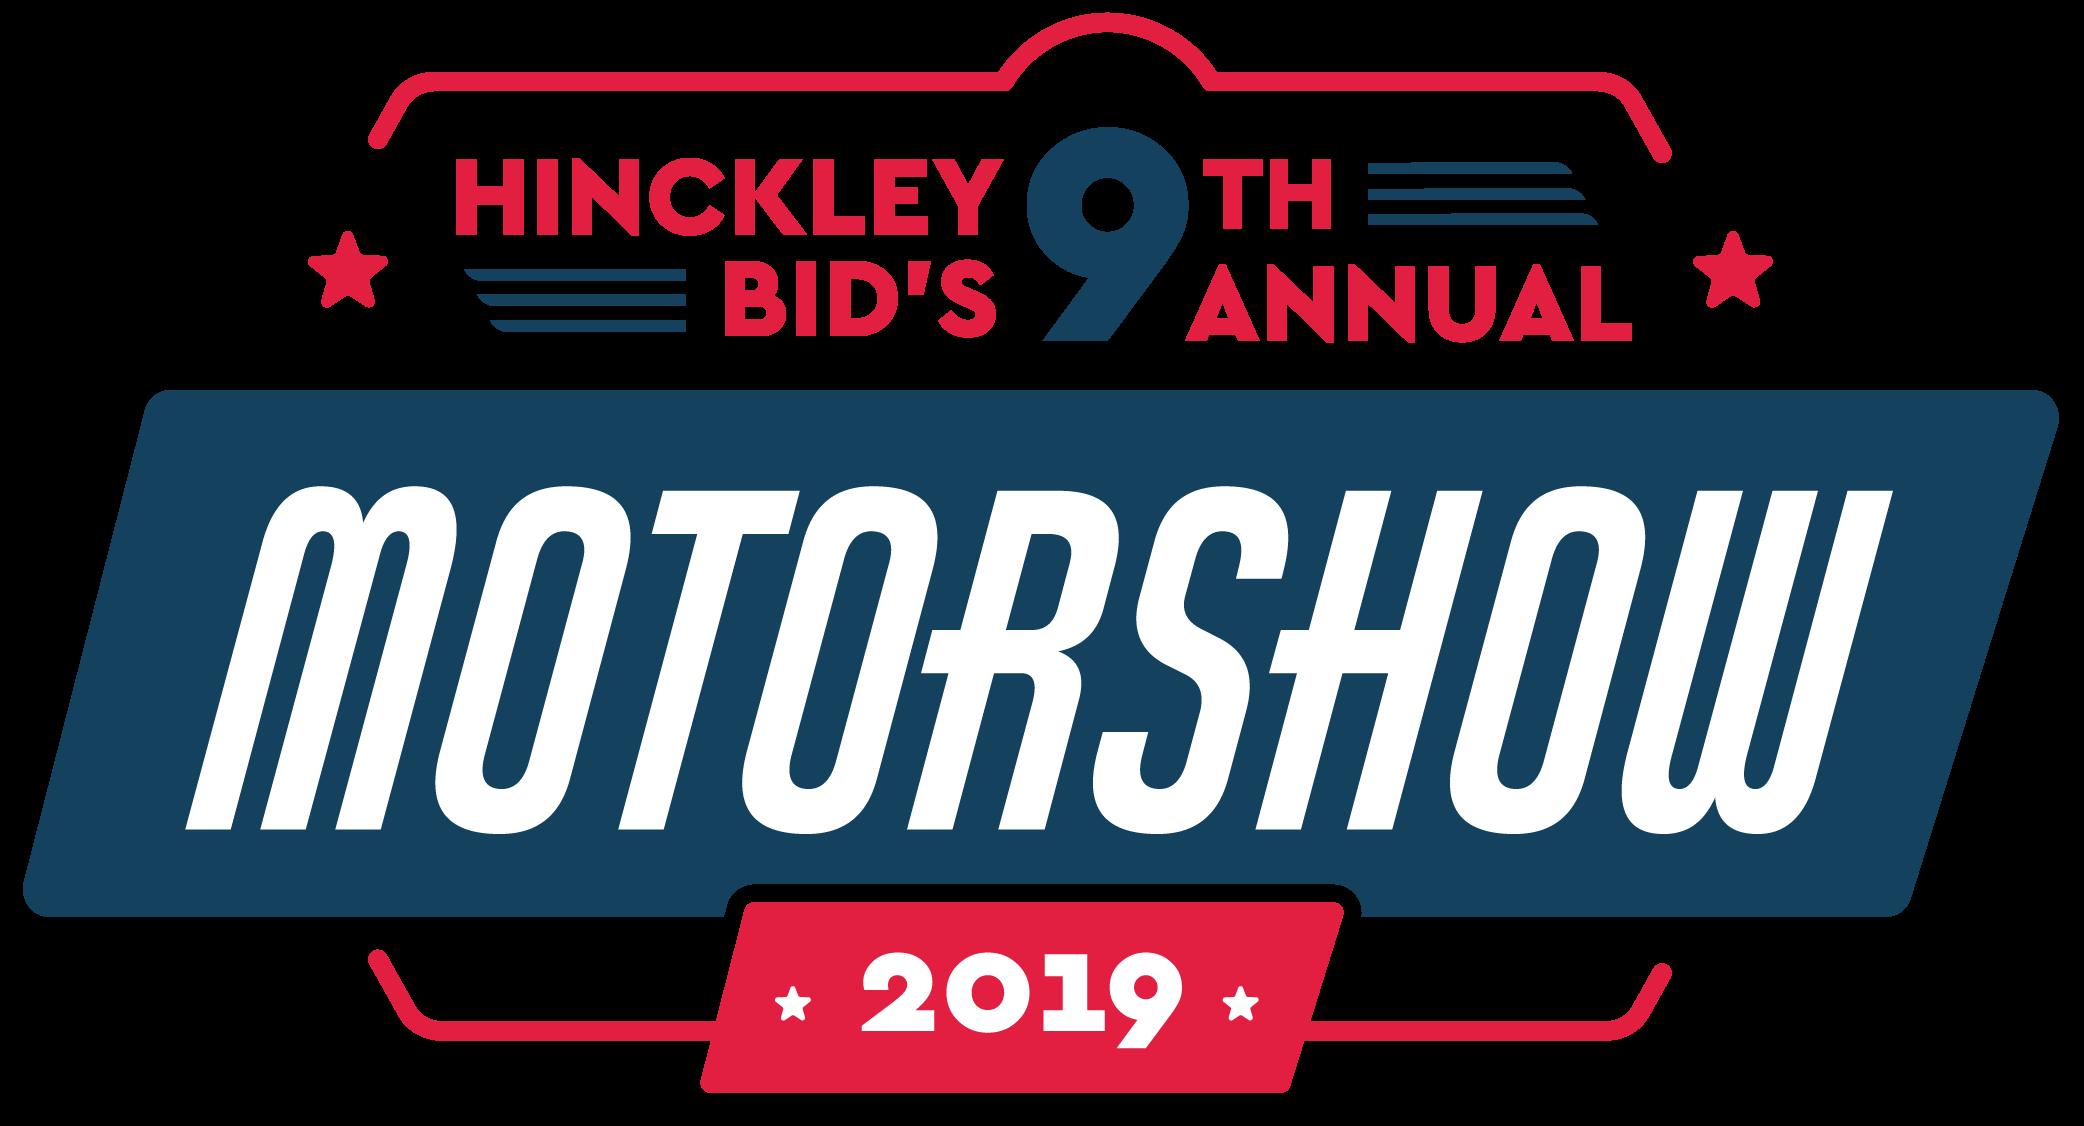 Hinckley Motorshow Registration